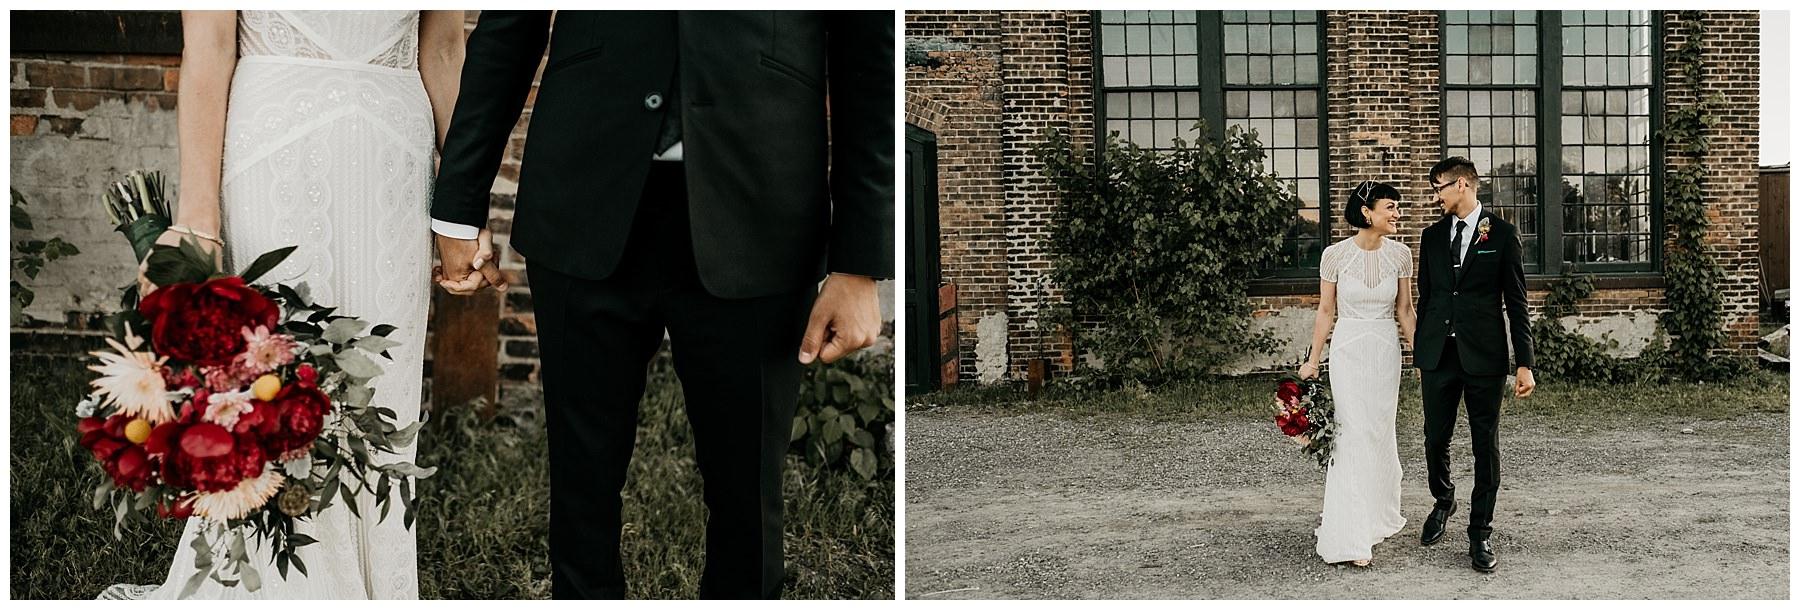 Jon and Jen New York Wedding-173.jpg